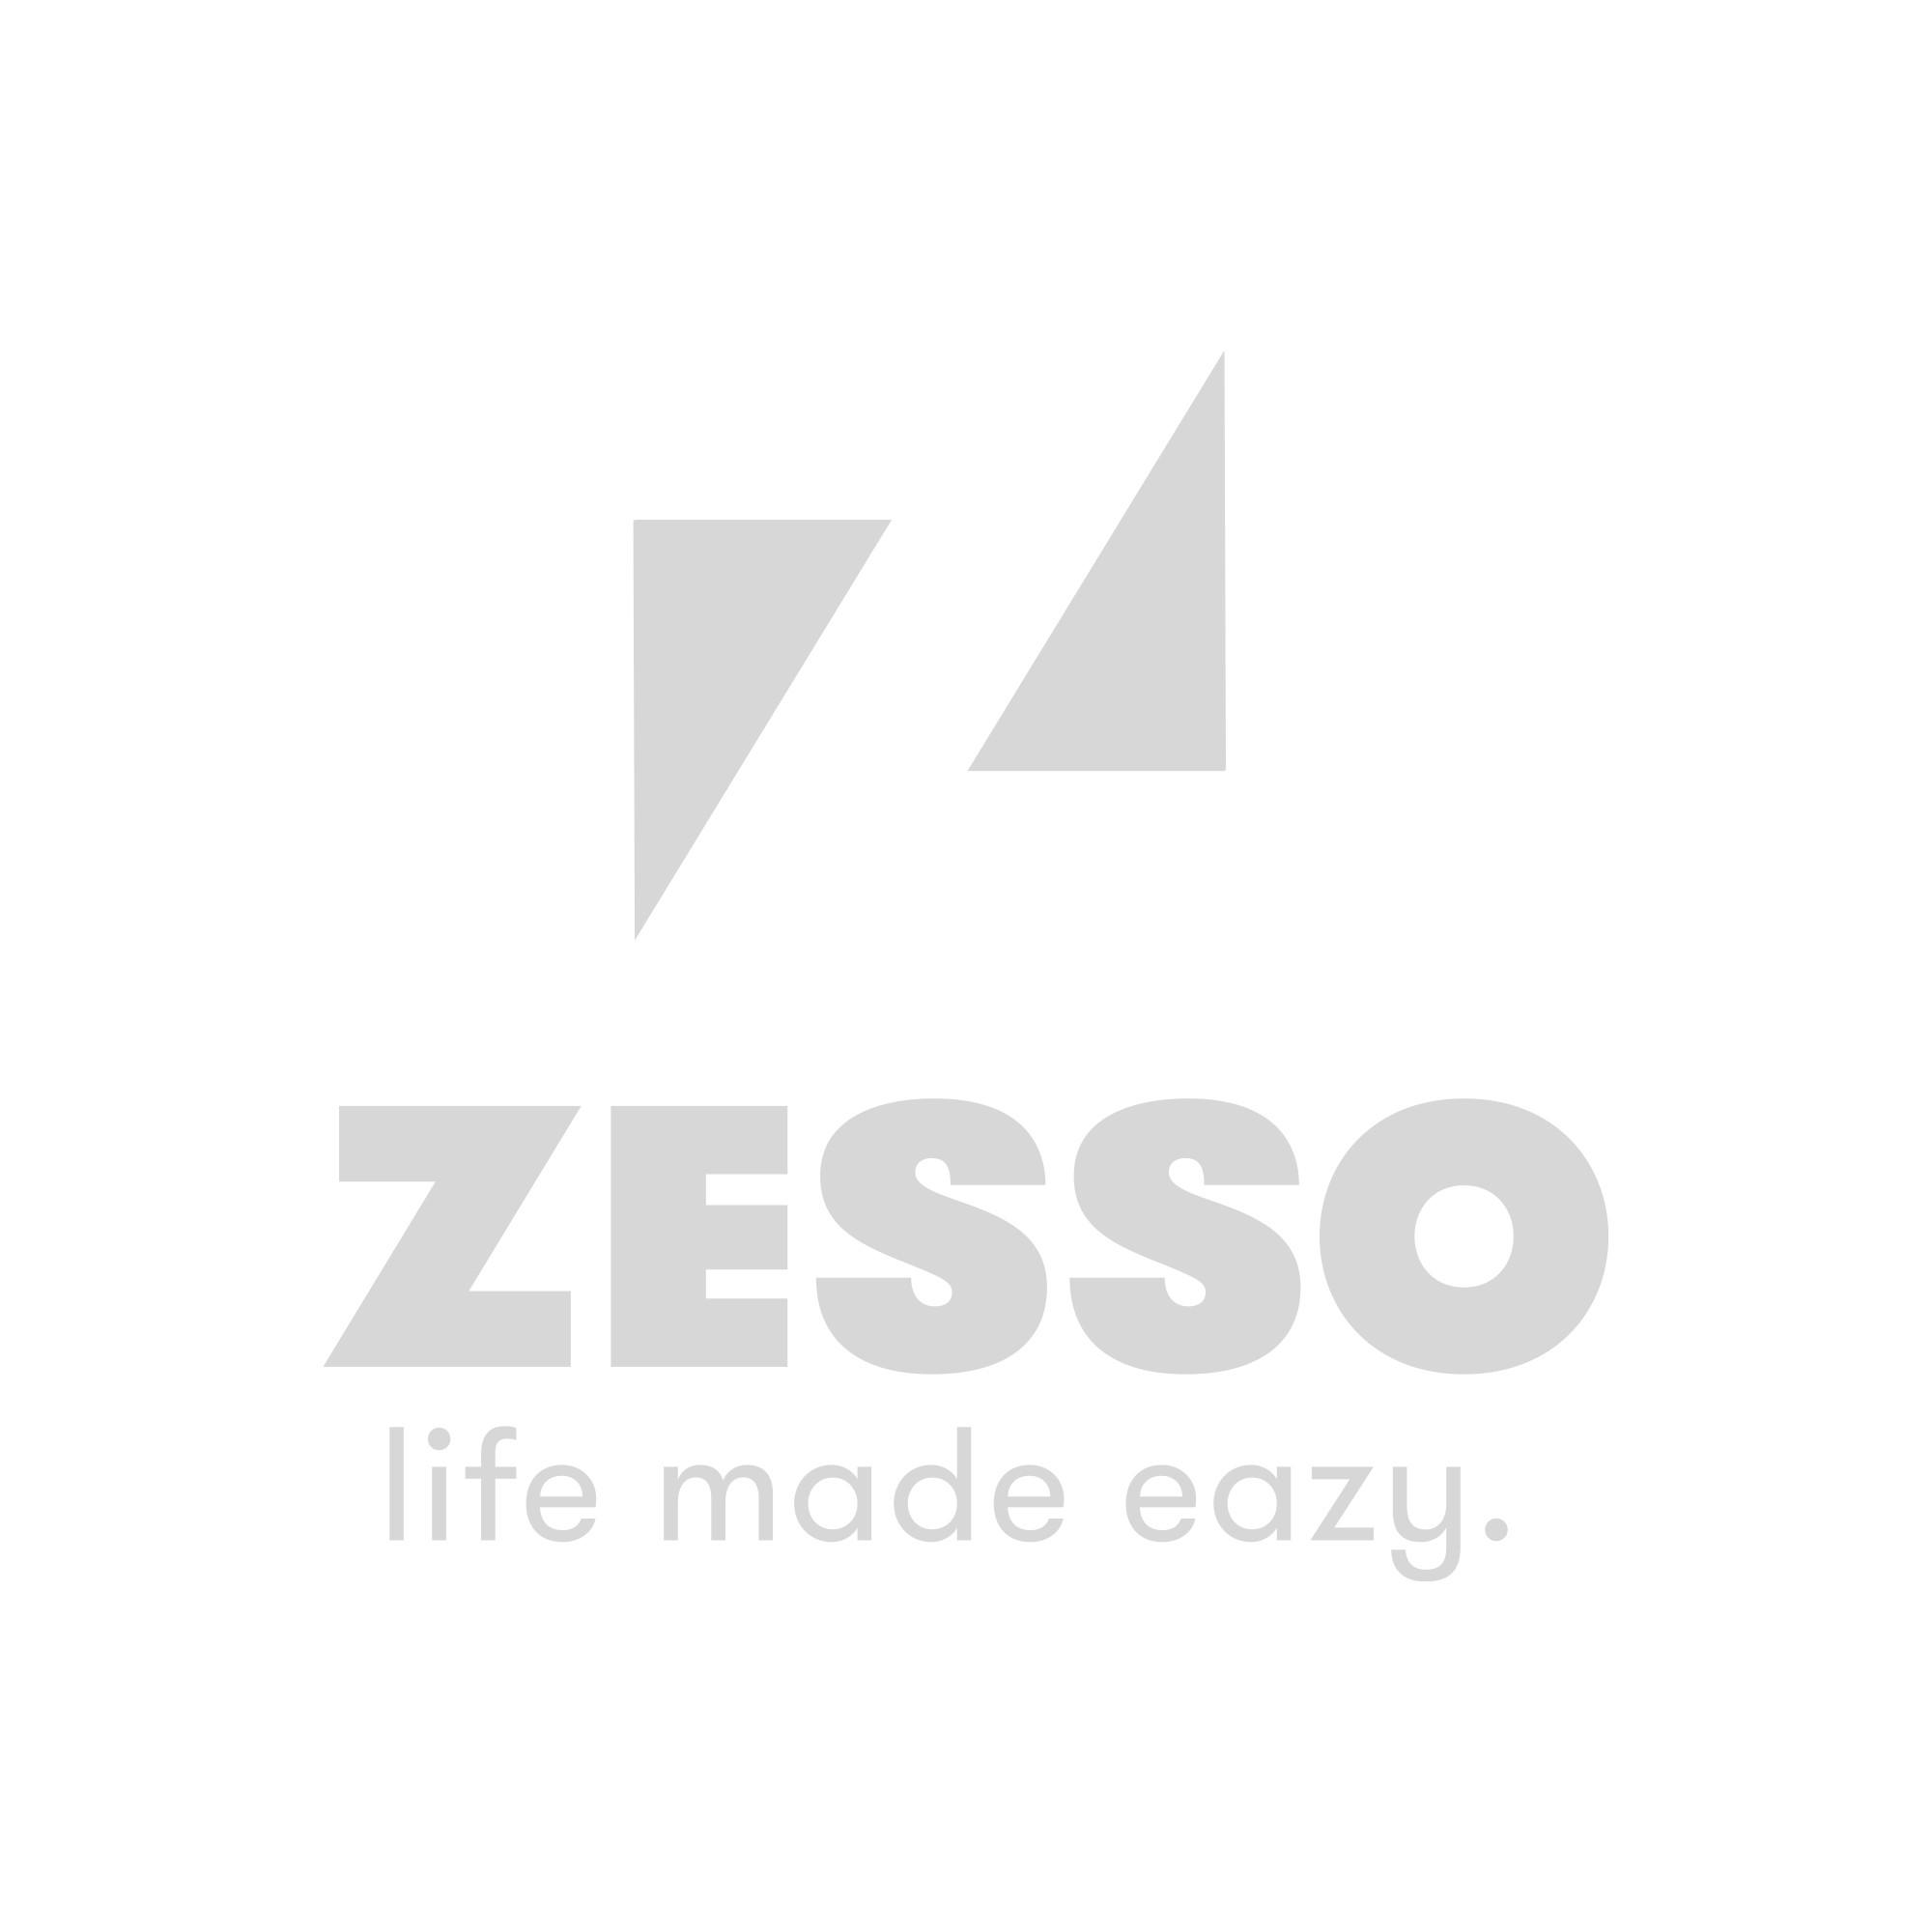 Baninni Loopfiets 2 - 3 Jaar Wheely Zilver